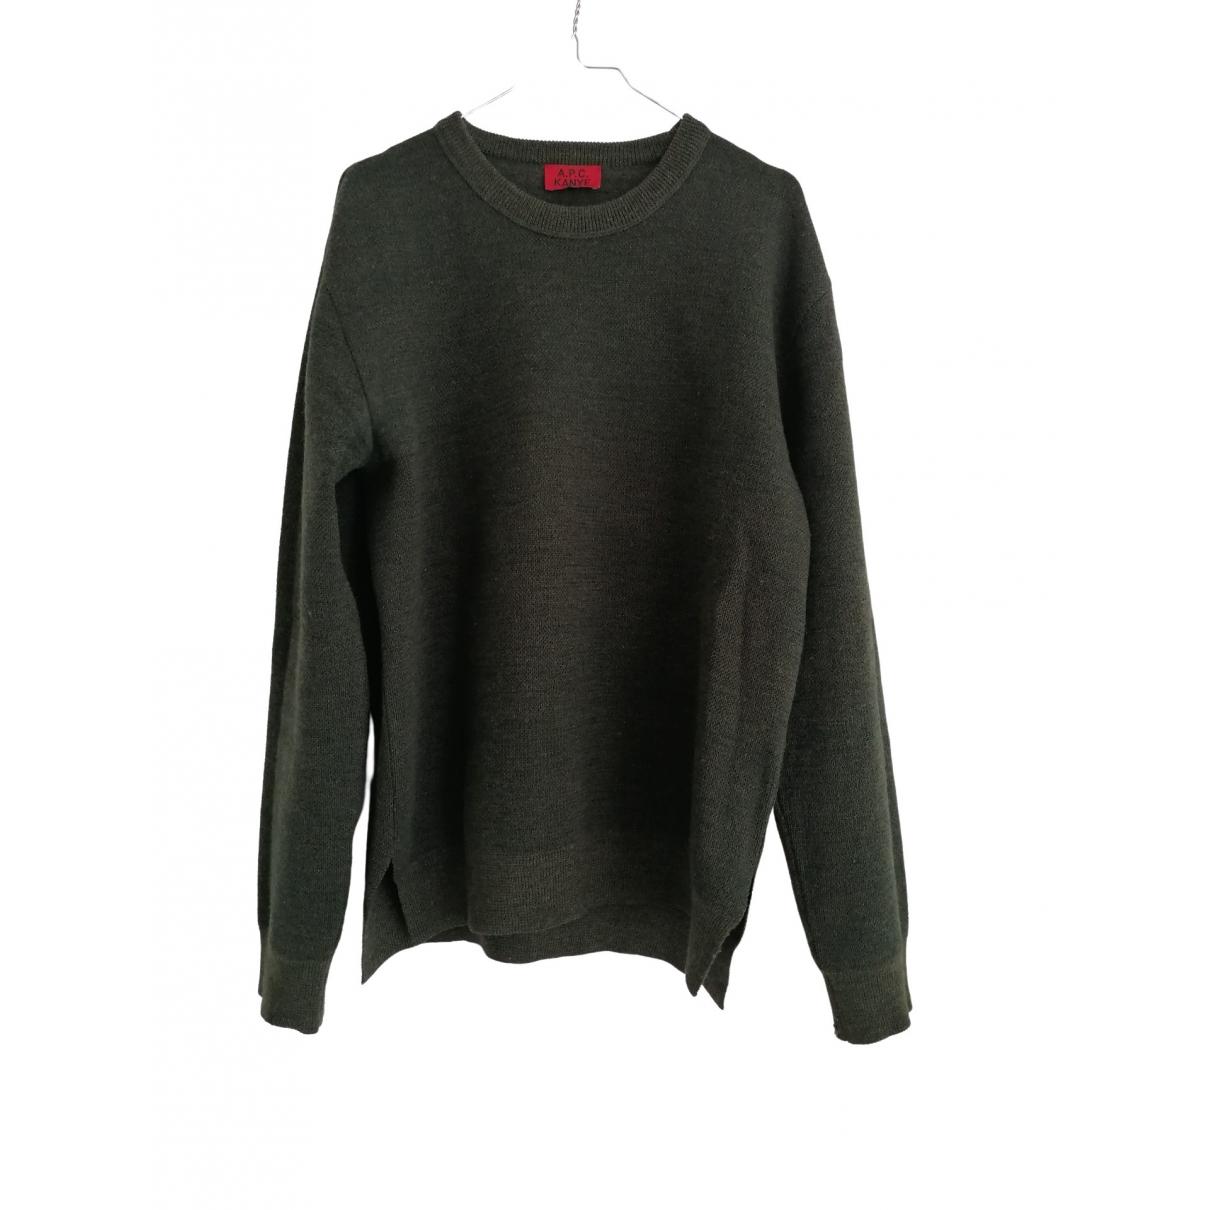 Apc \N Khaki Wool Knitwear & Sweatshirts for Men M International